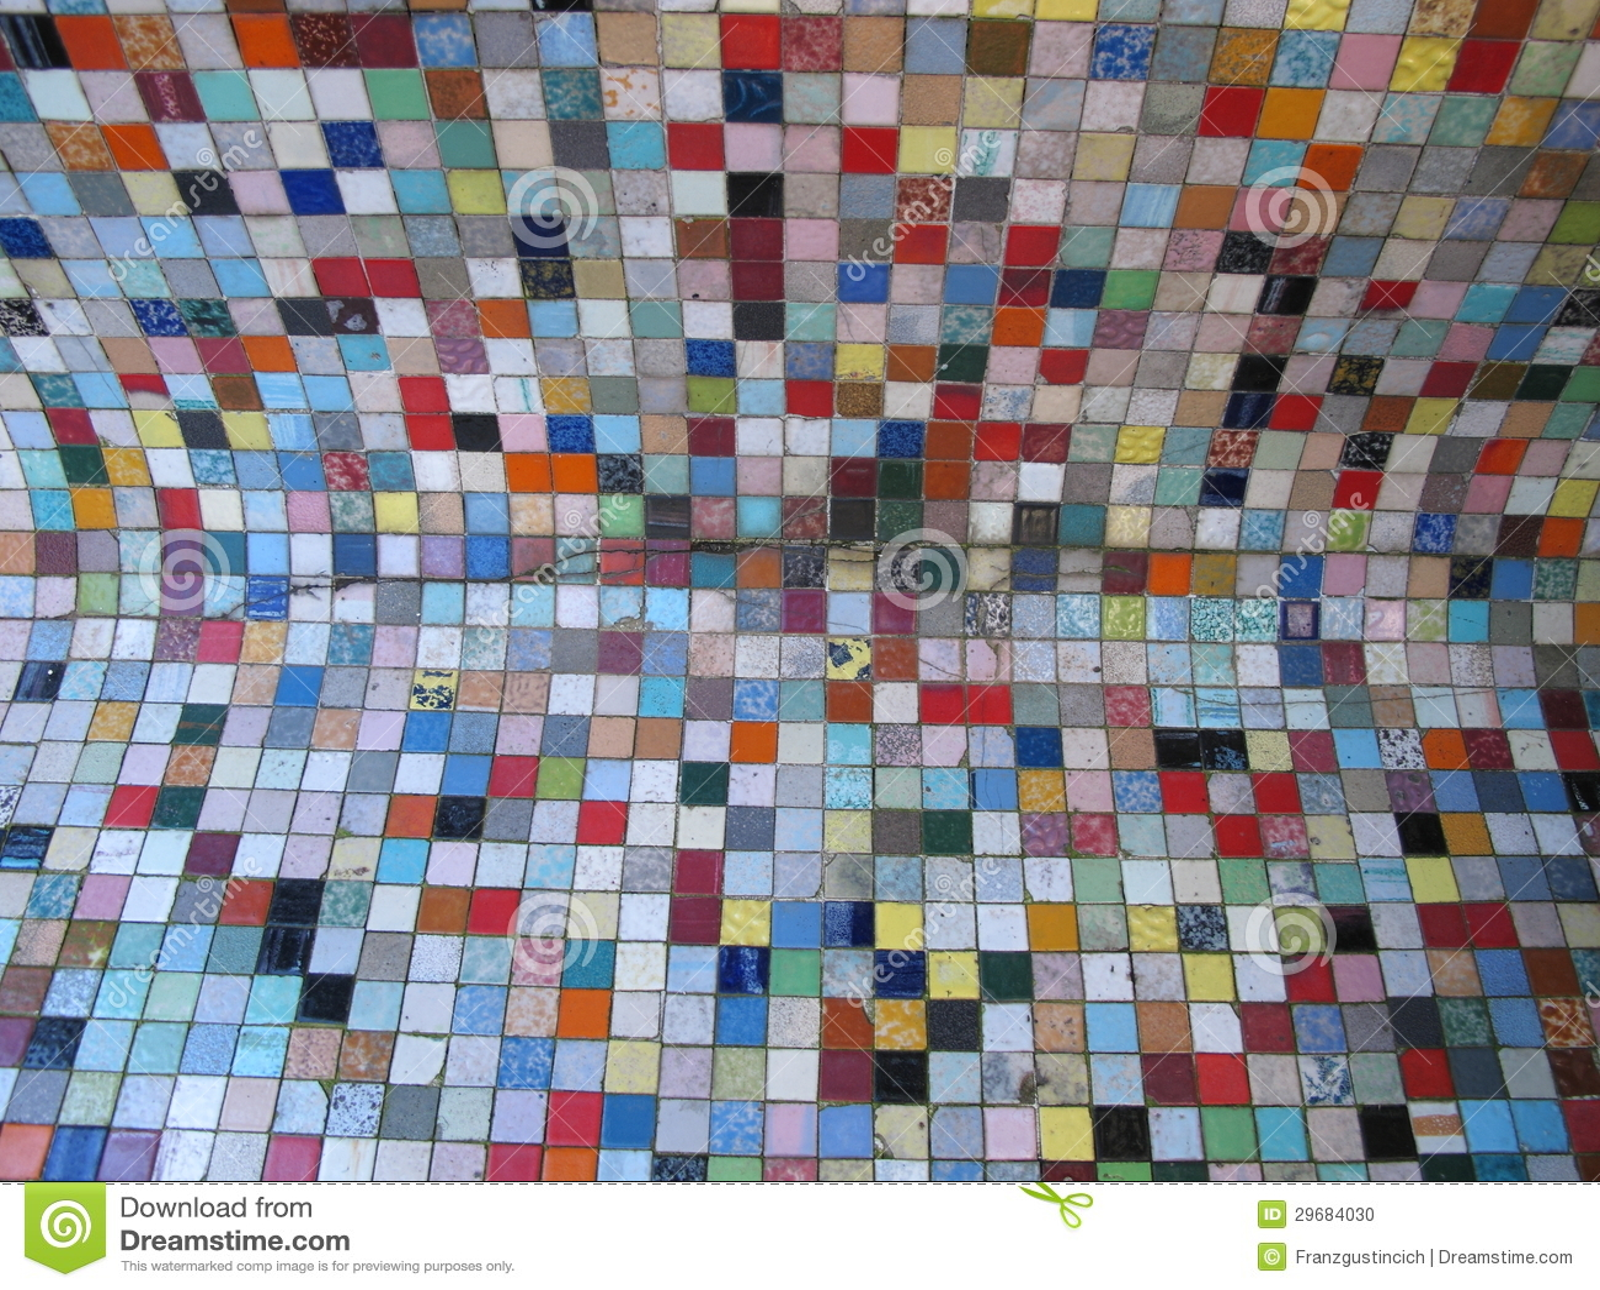 farbige glasfliesen stockfoto bild 29684030. Black Bedroom Furniture Sets. Home Design Ideas